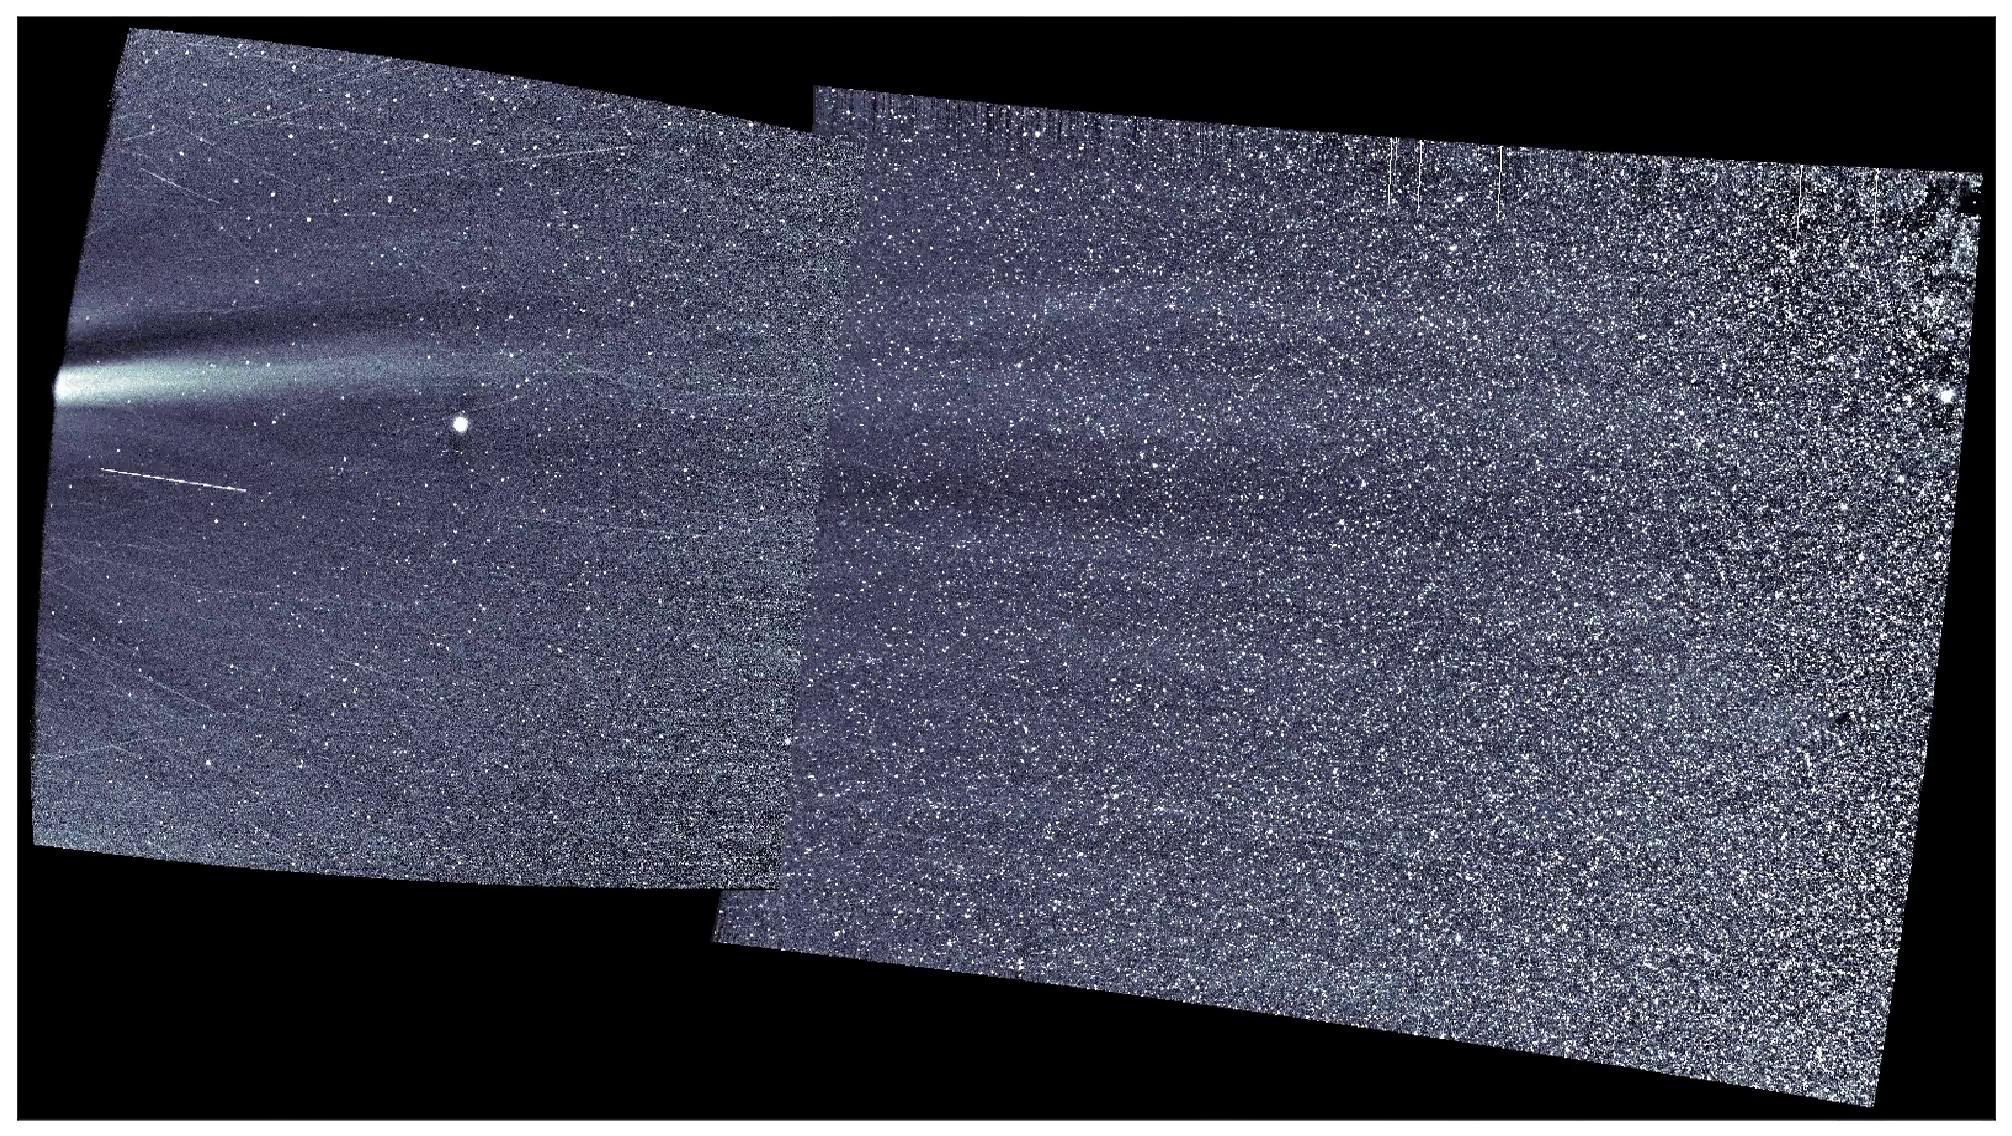 One Year of NASA's Parker Solar Probe